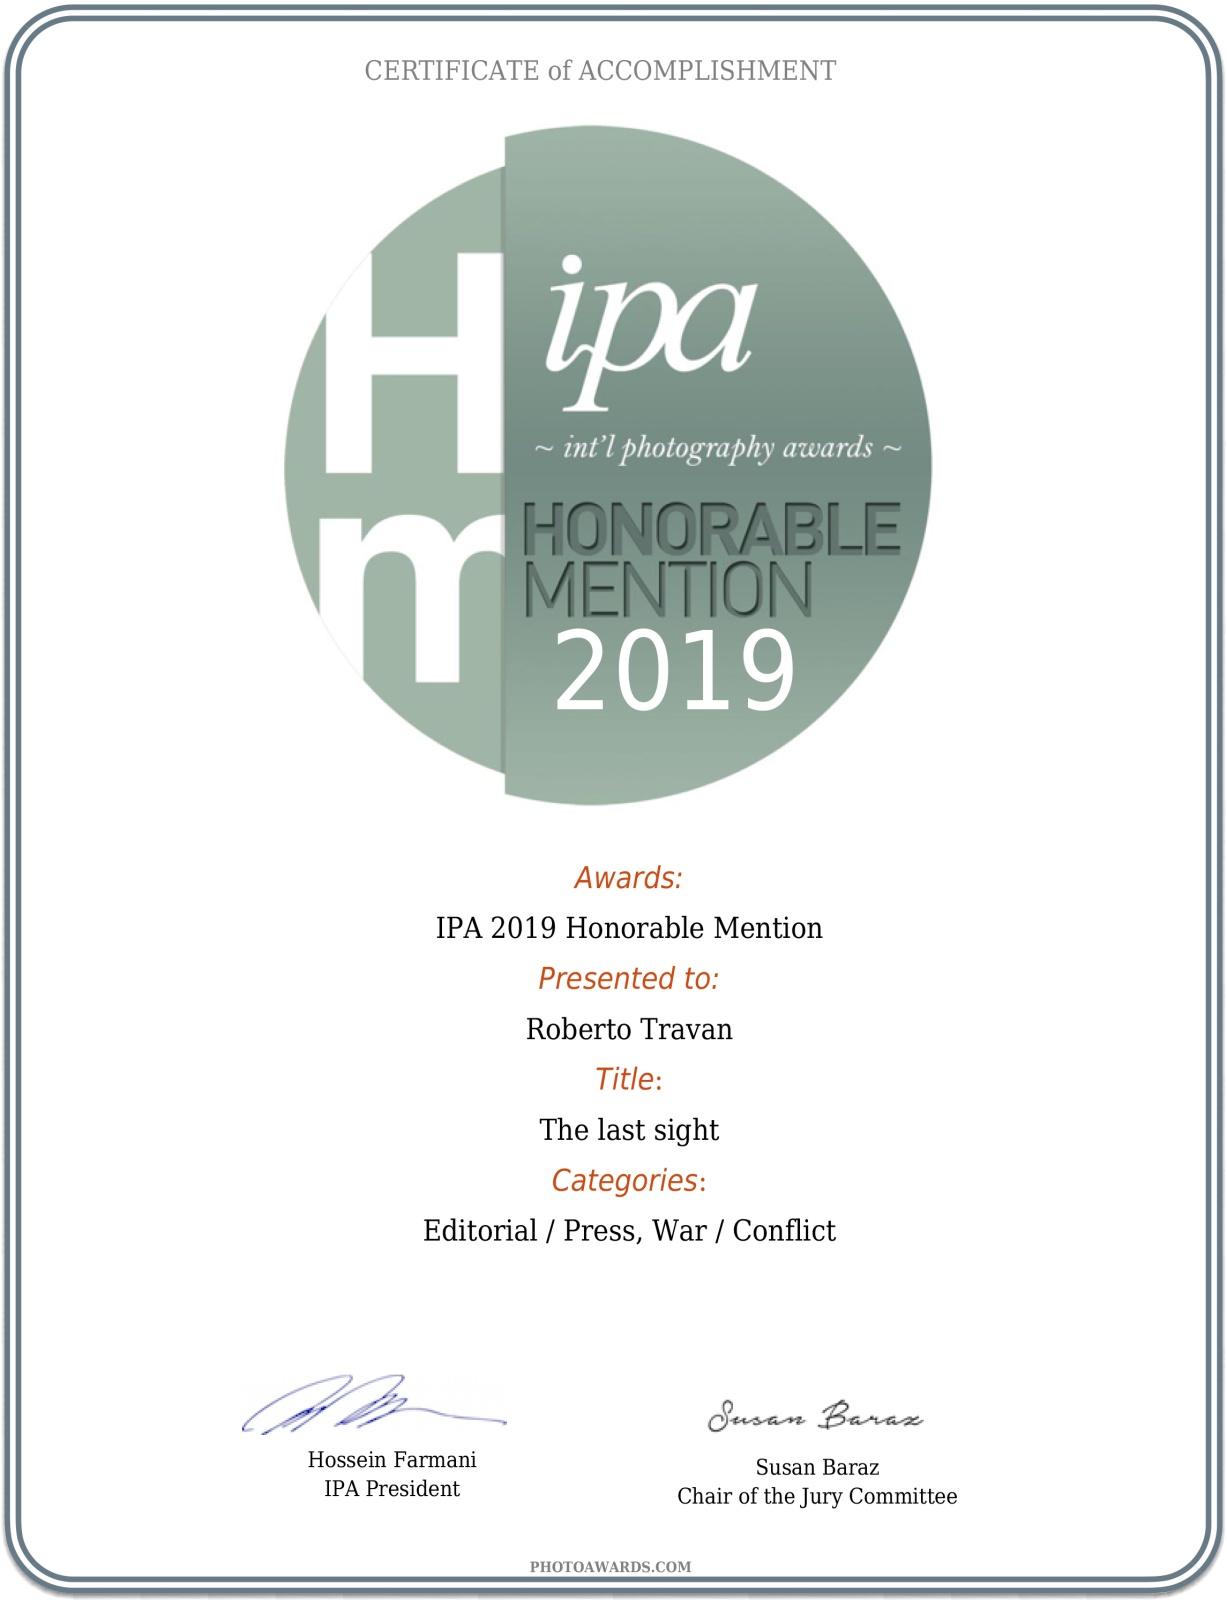 2019 - International Photography Awards